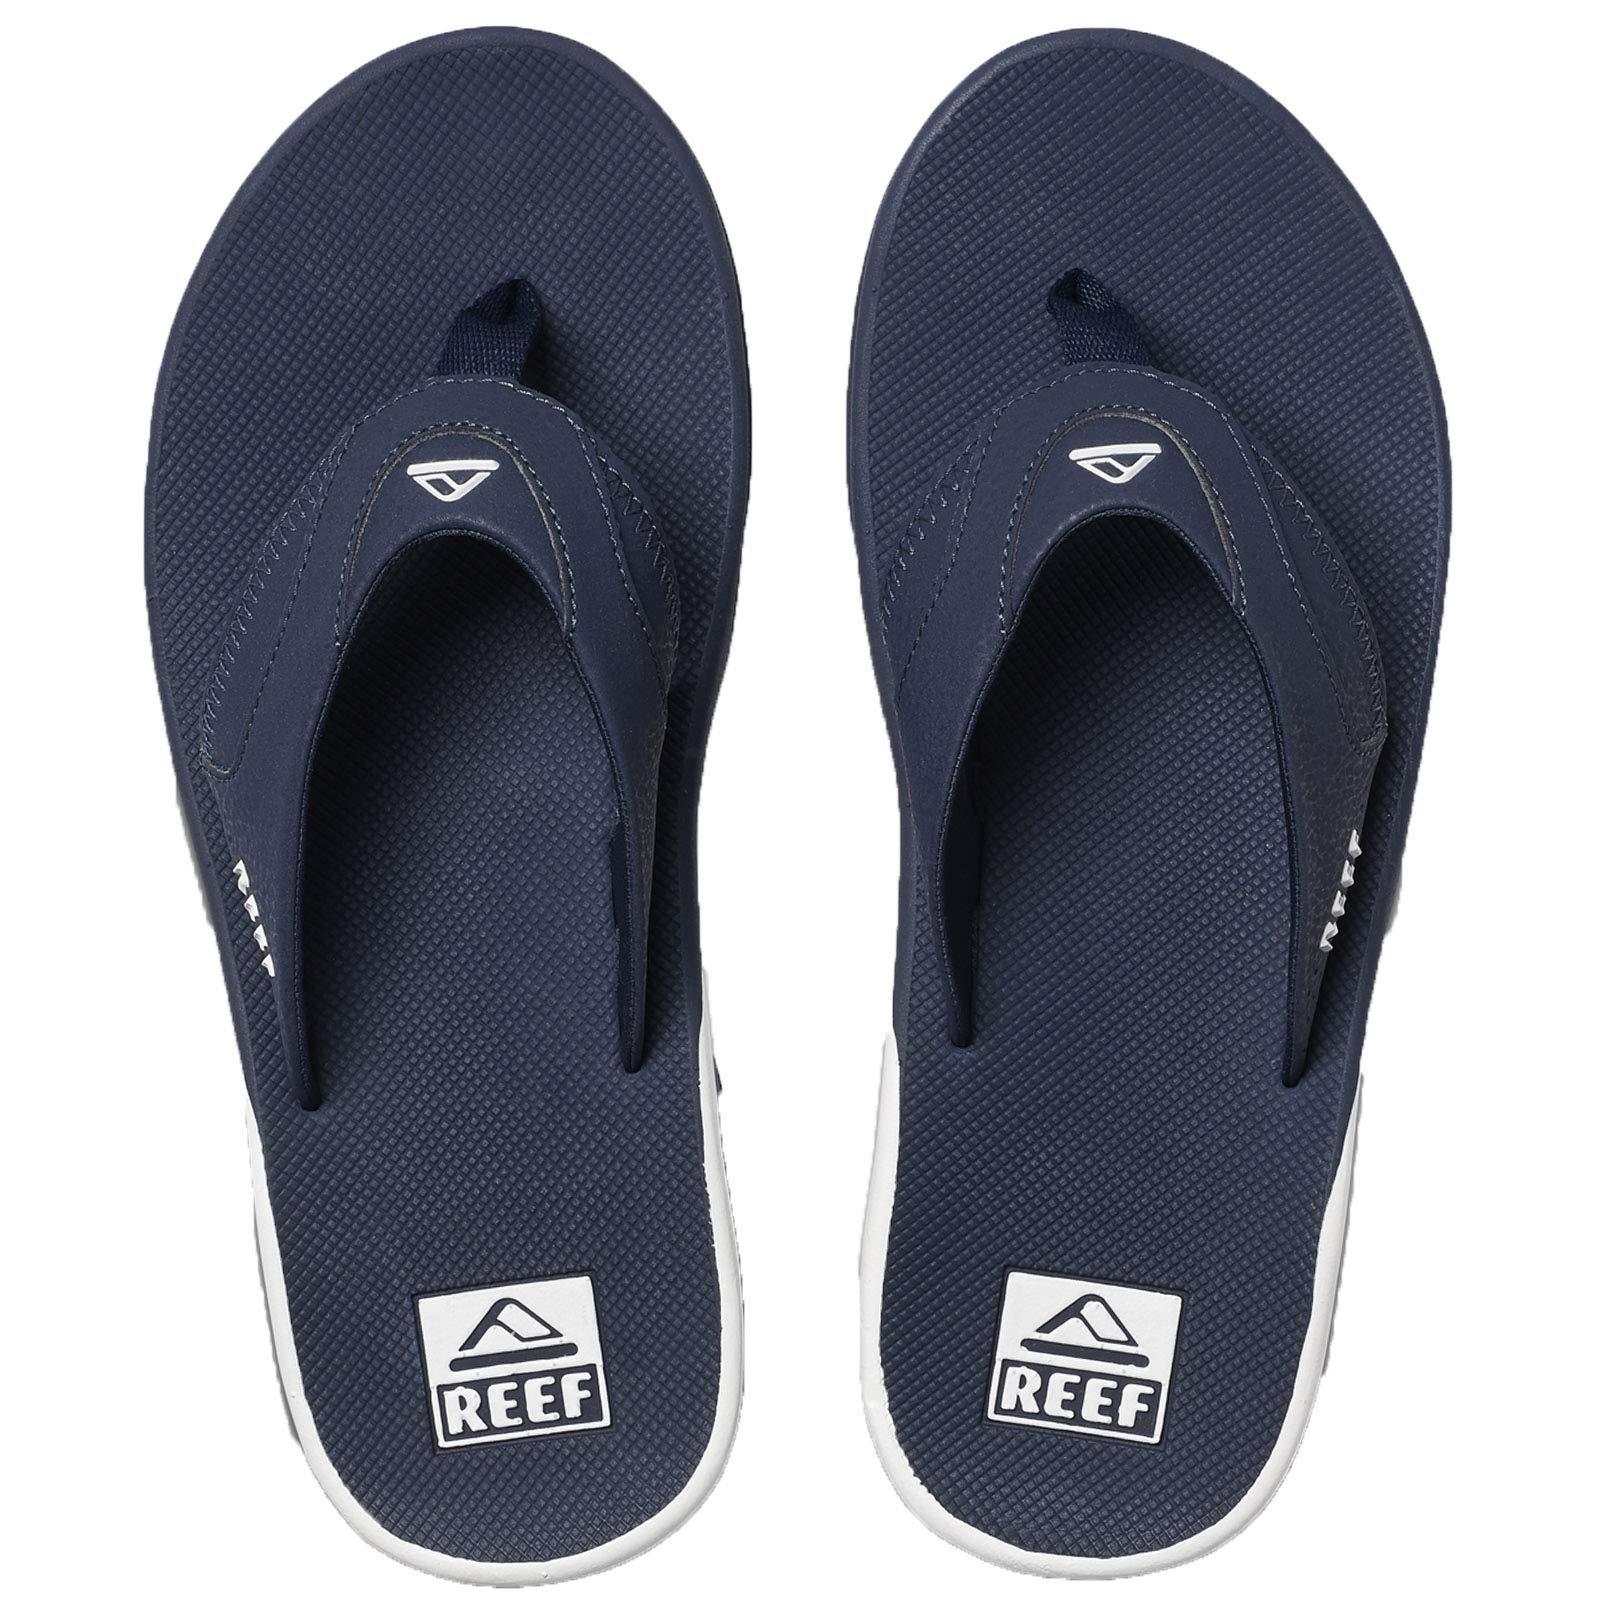 Reef Men's Fanning Sandal Navy/White 110 M US